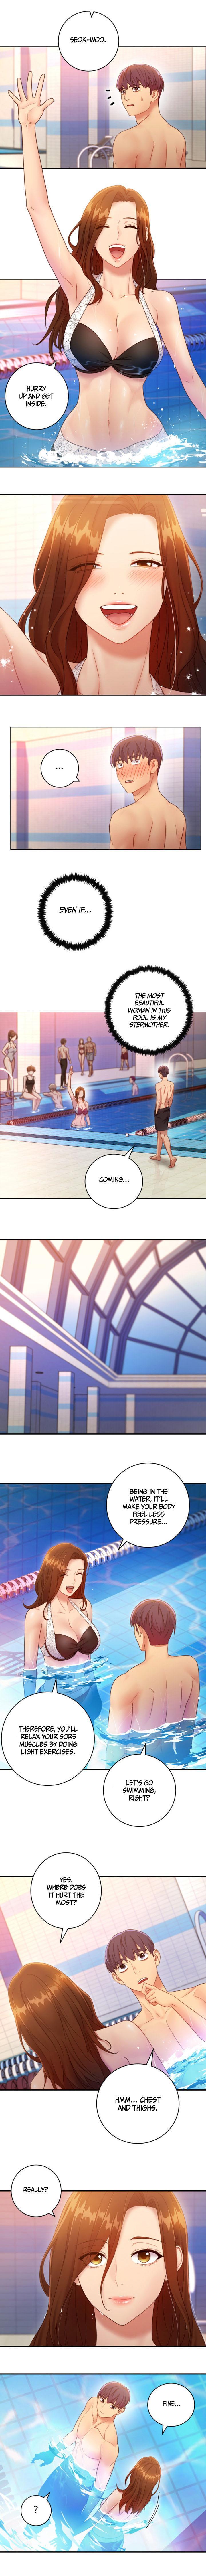 [Neck Pilllow] Stepmother Friends Ch.39/? [English] [Hentai Universe] NEW! 13/10/2020 313